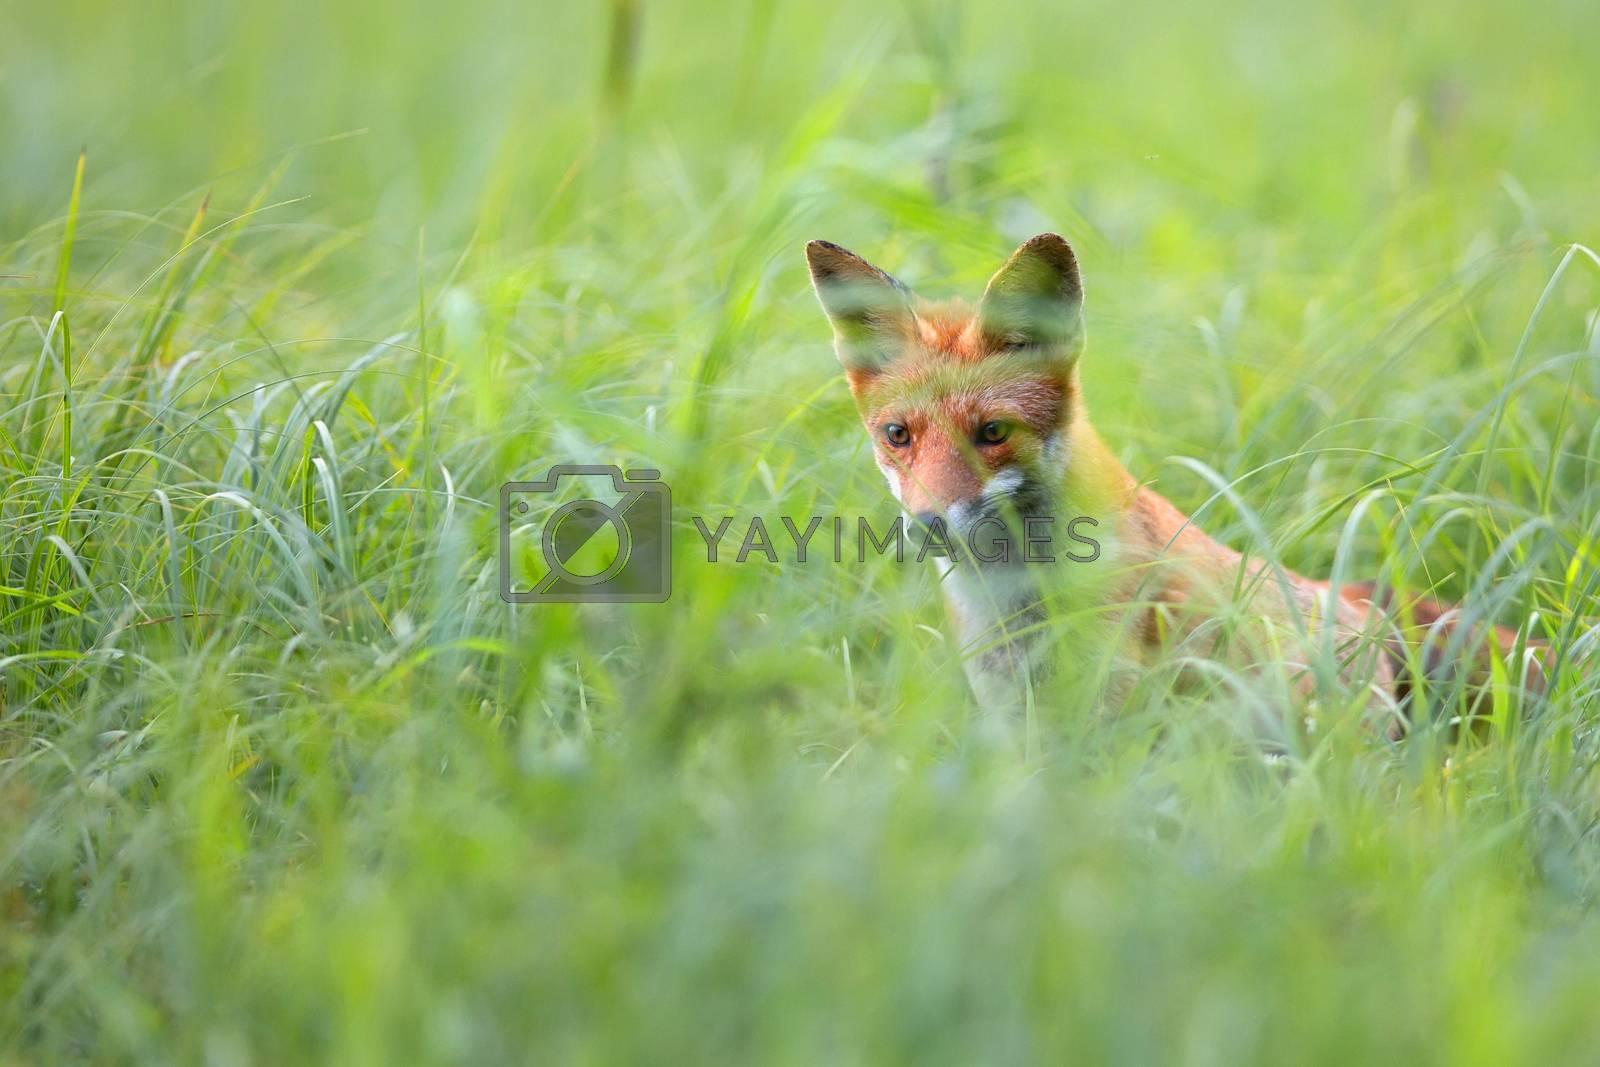 Fox in the grass in the wild